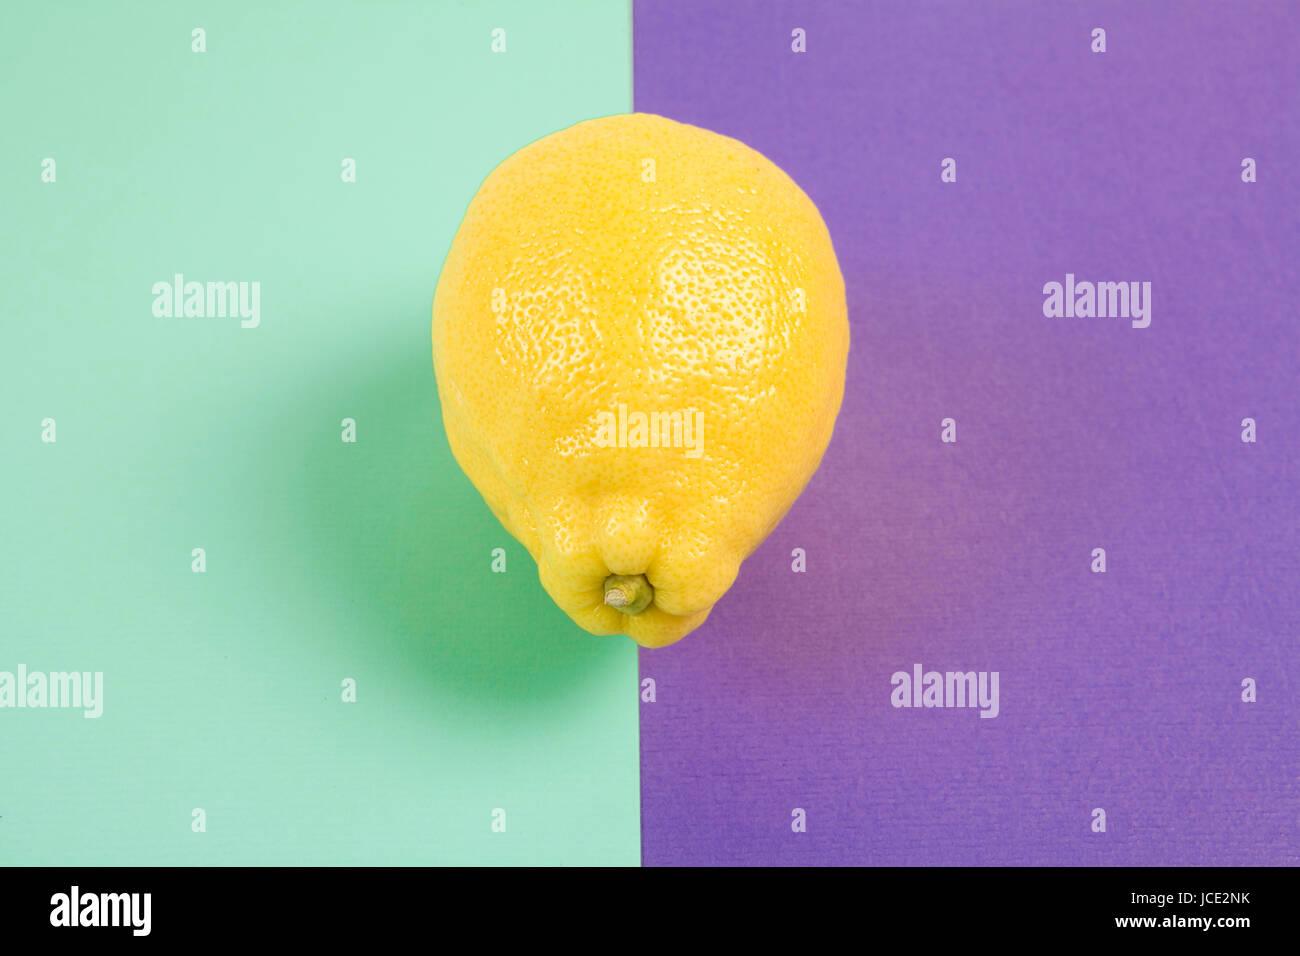 Pop minimal still life photography. lemon isolated on a Pop minimal still life photography. Lemon yellow isolated - Stock Image